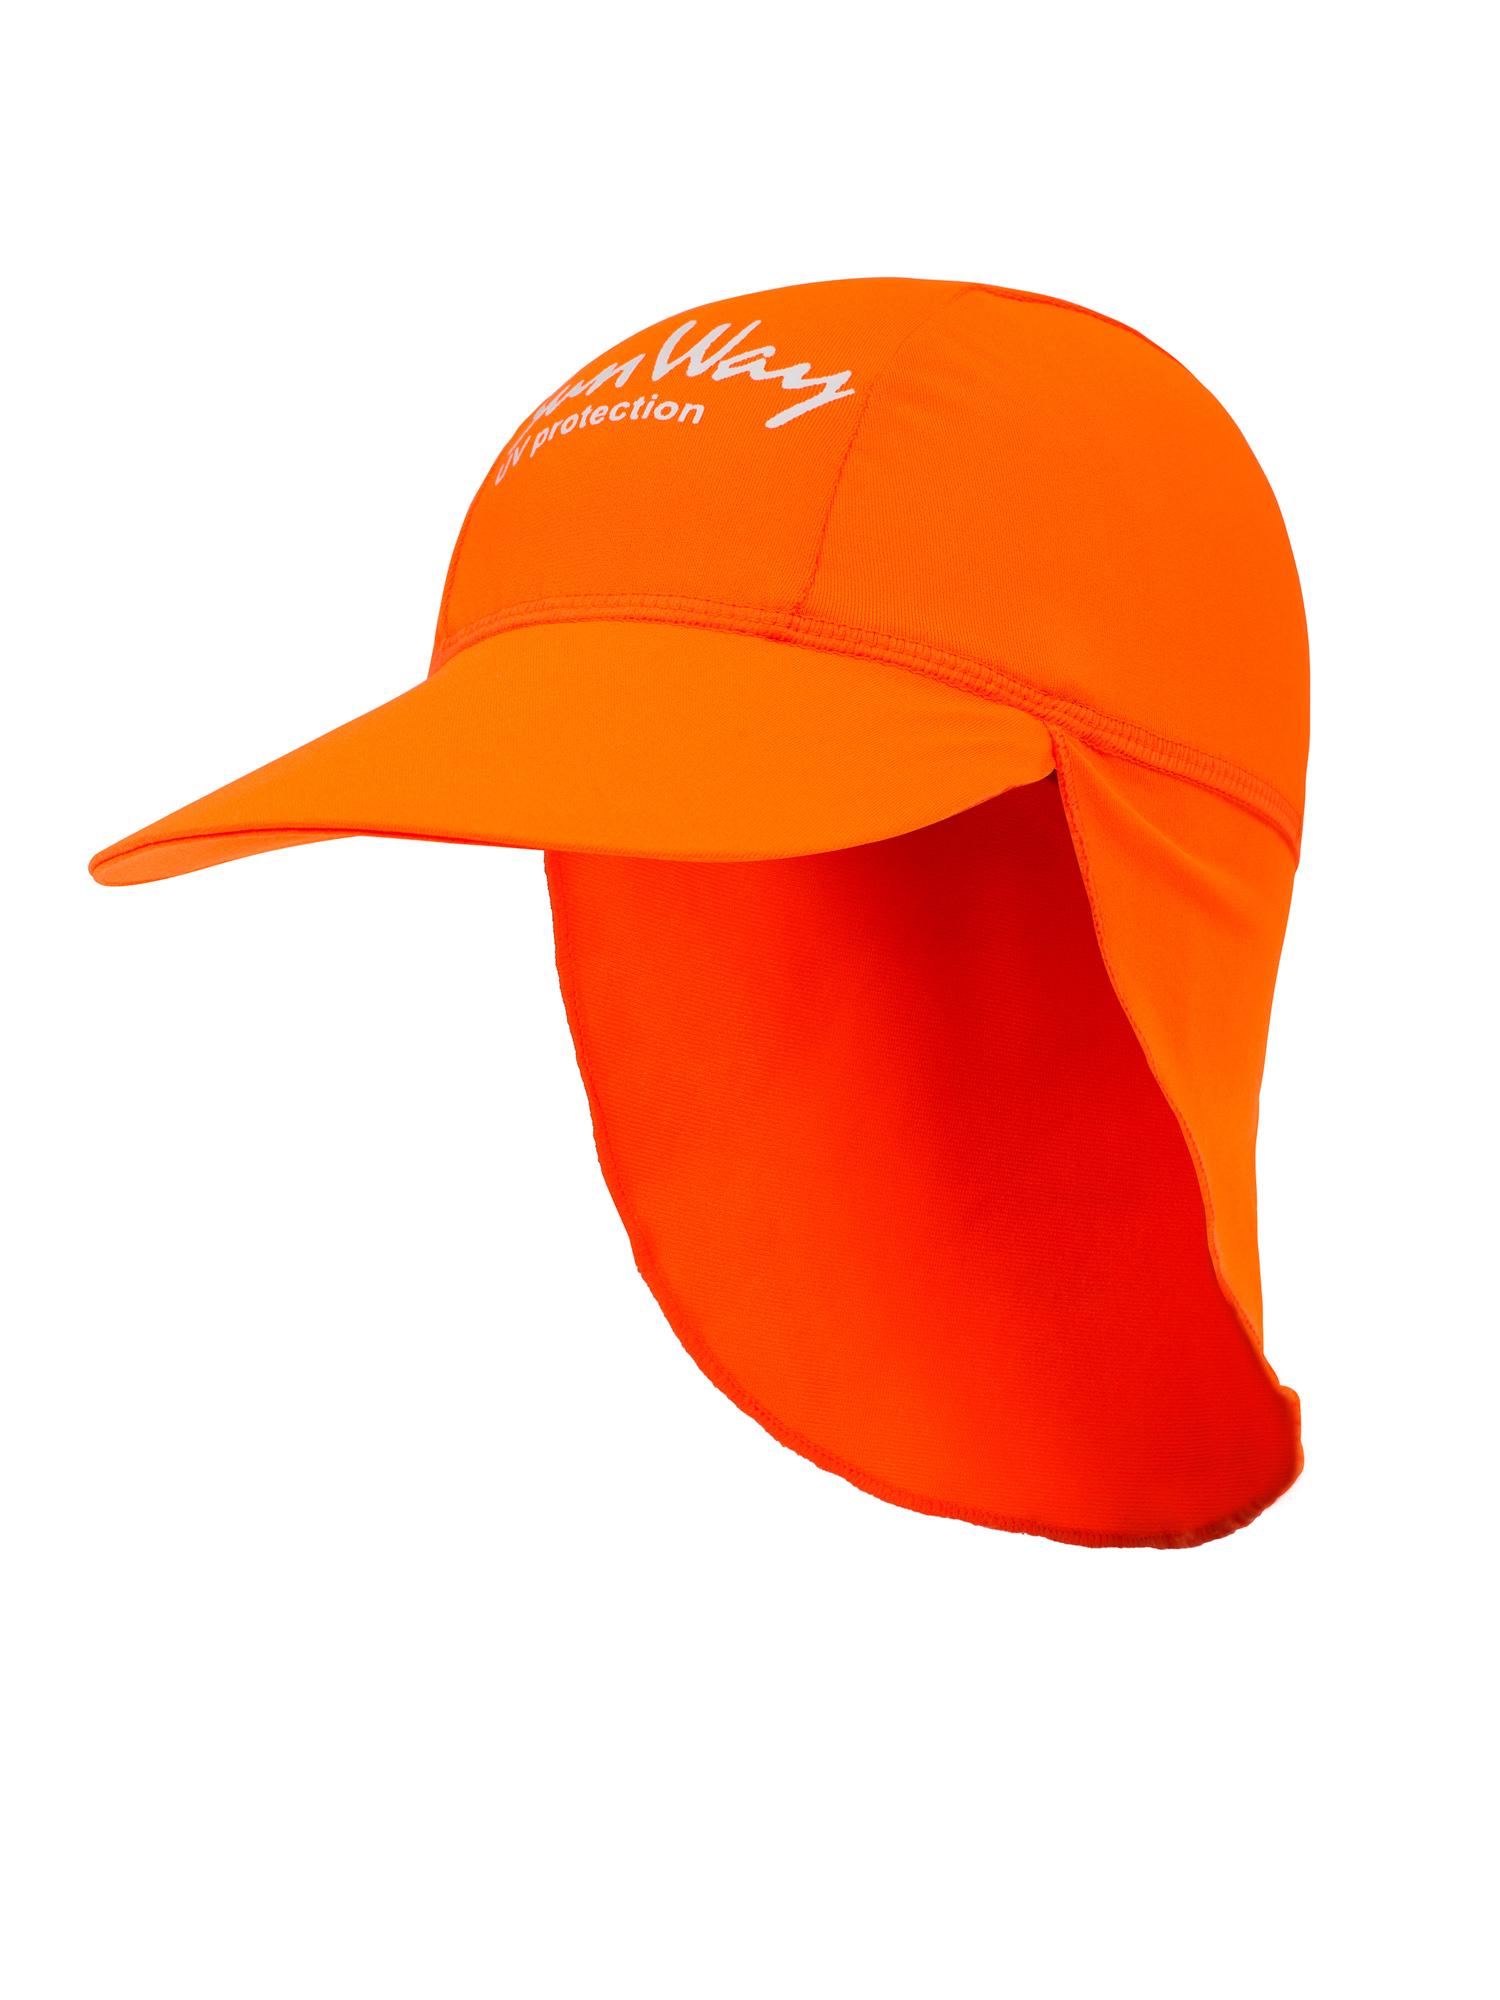 SunWay's Orange Legionnaire Hat